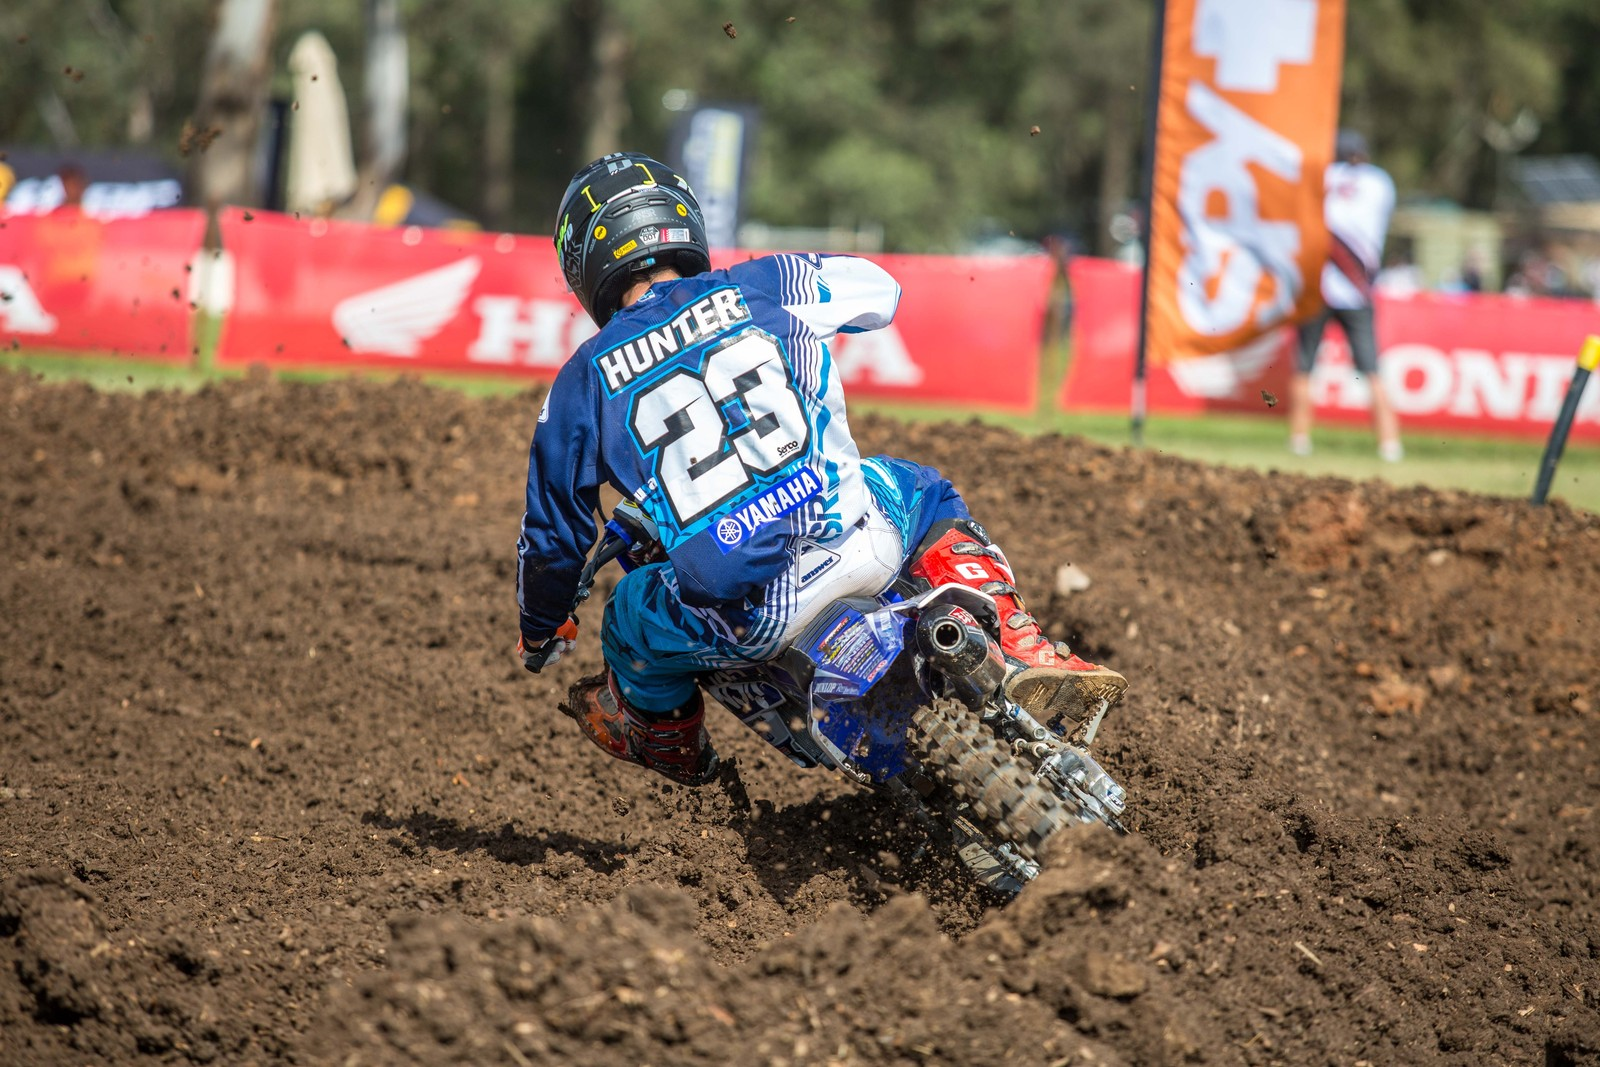 Wade Hunter - Australian Motul Motocross Nationals Round 2, Appin - Motocross Pictures - Vital MX